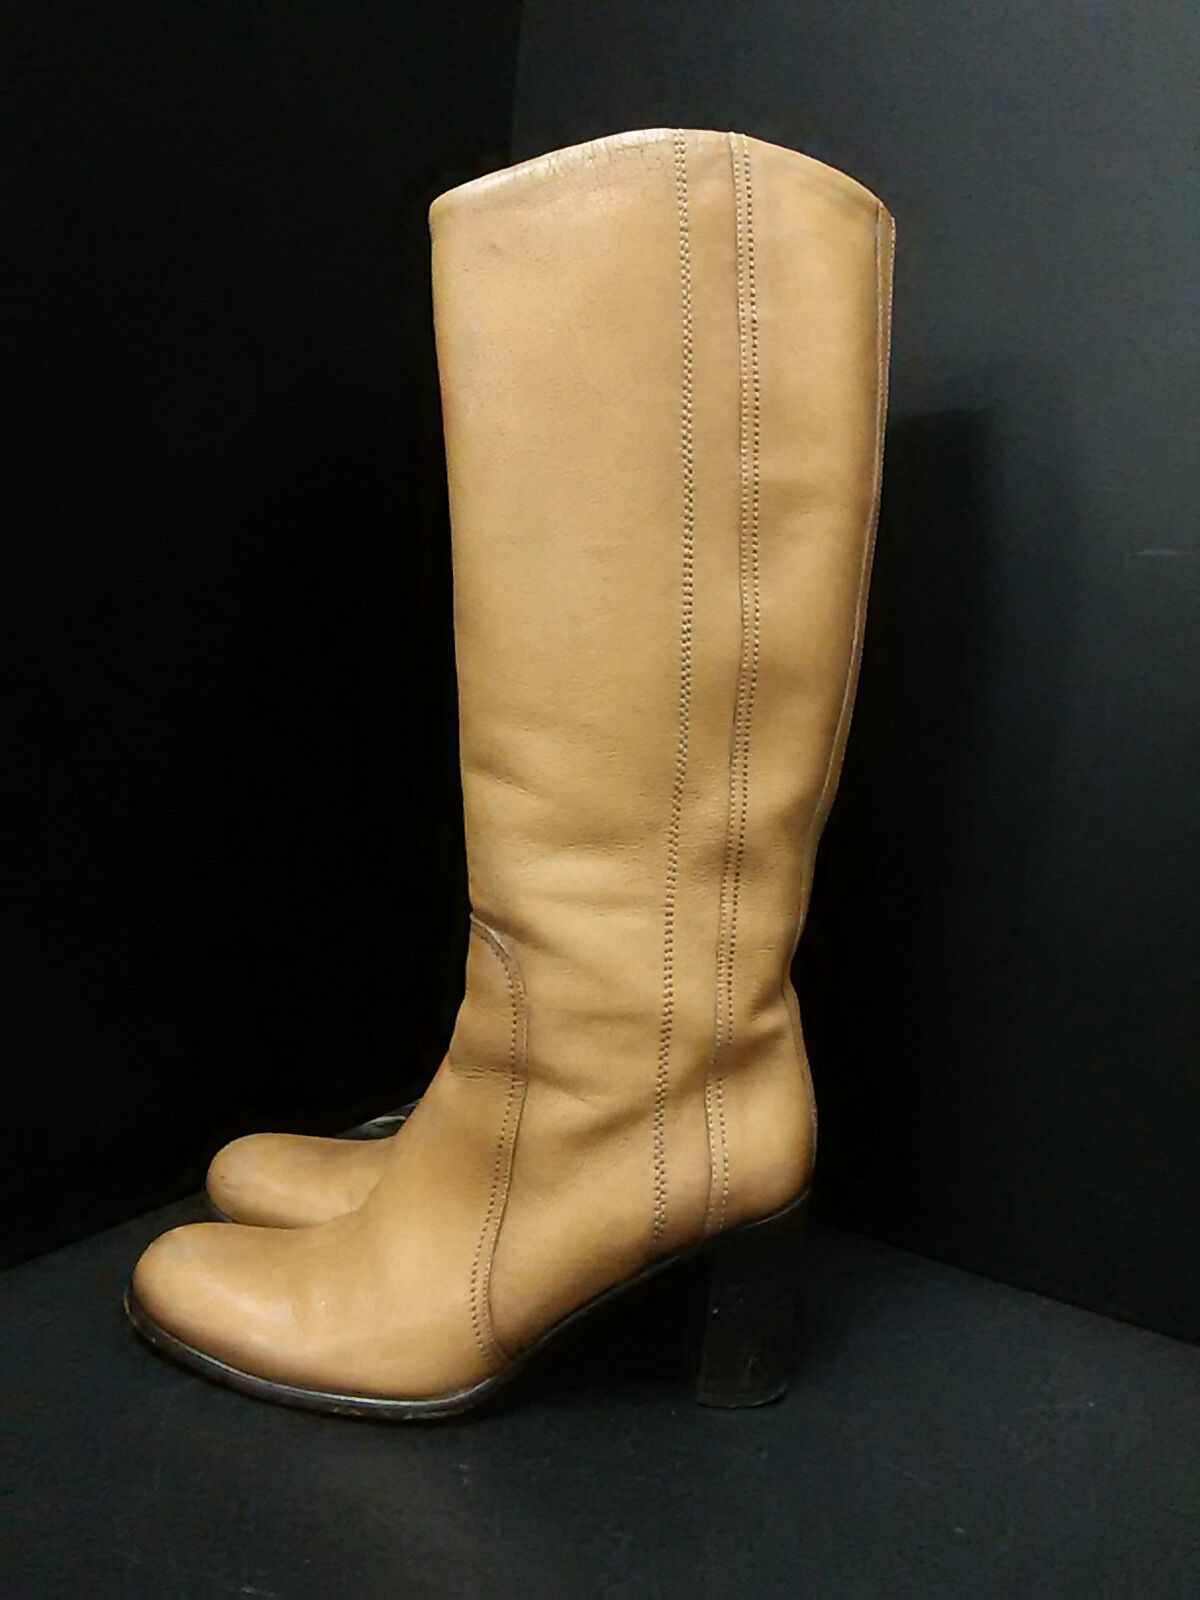 alessio balducci(アレッシオ バルドゥッチ)のブーツ